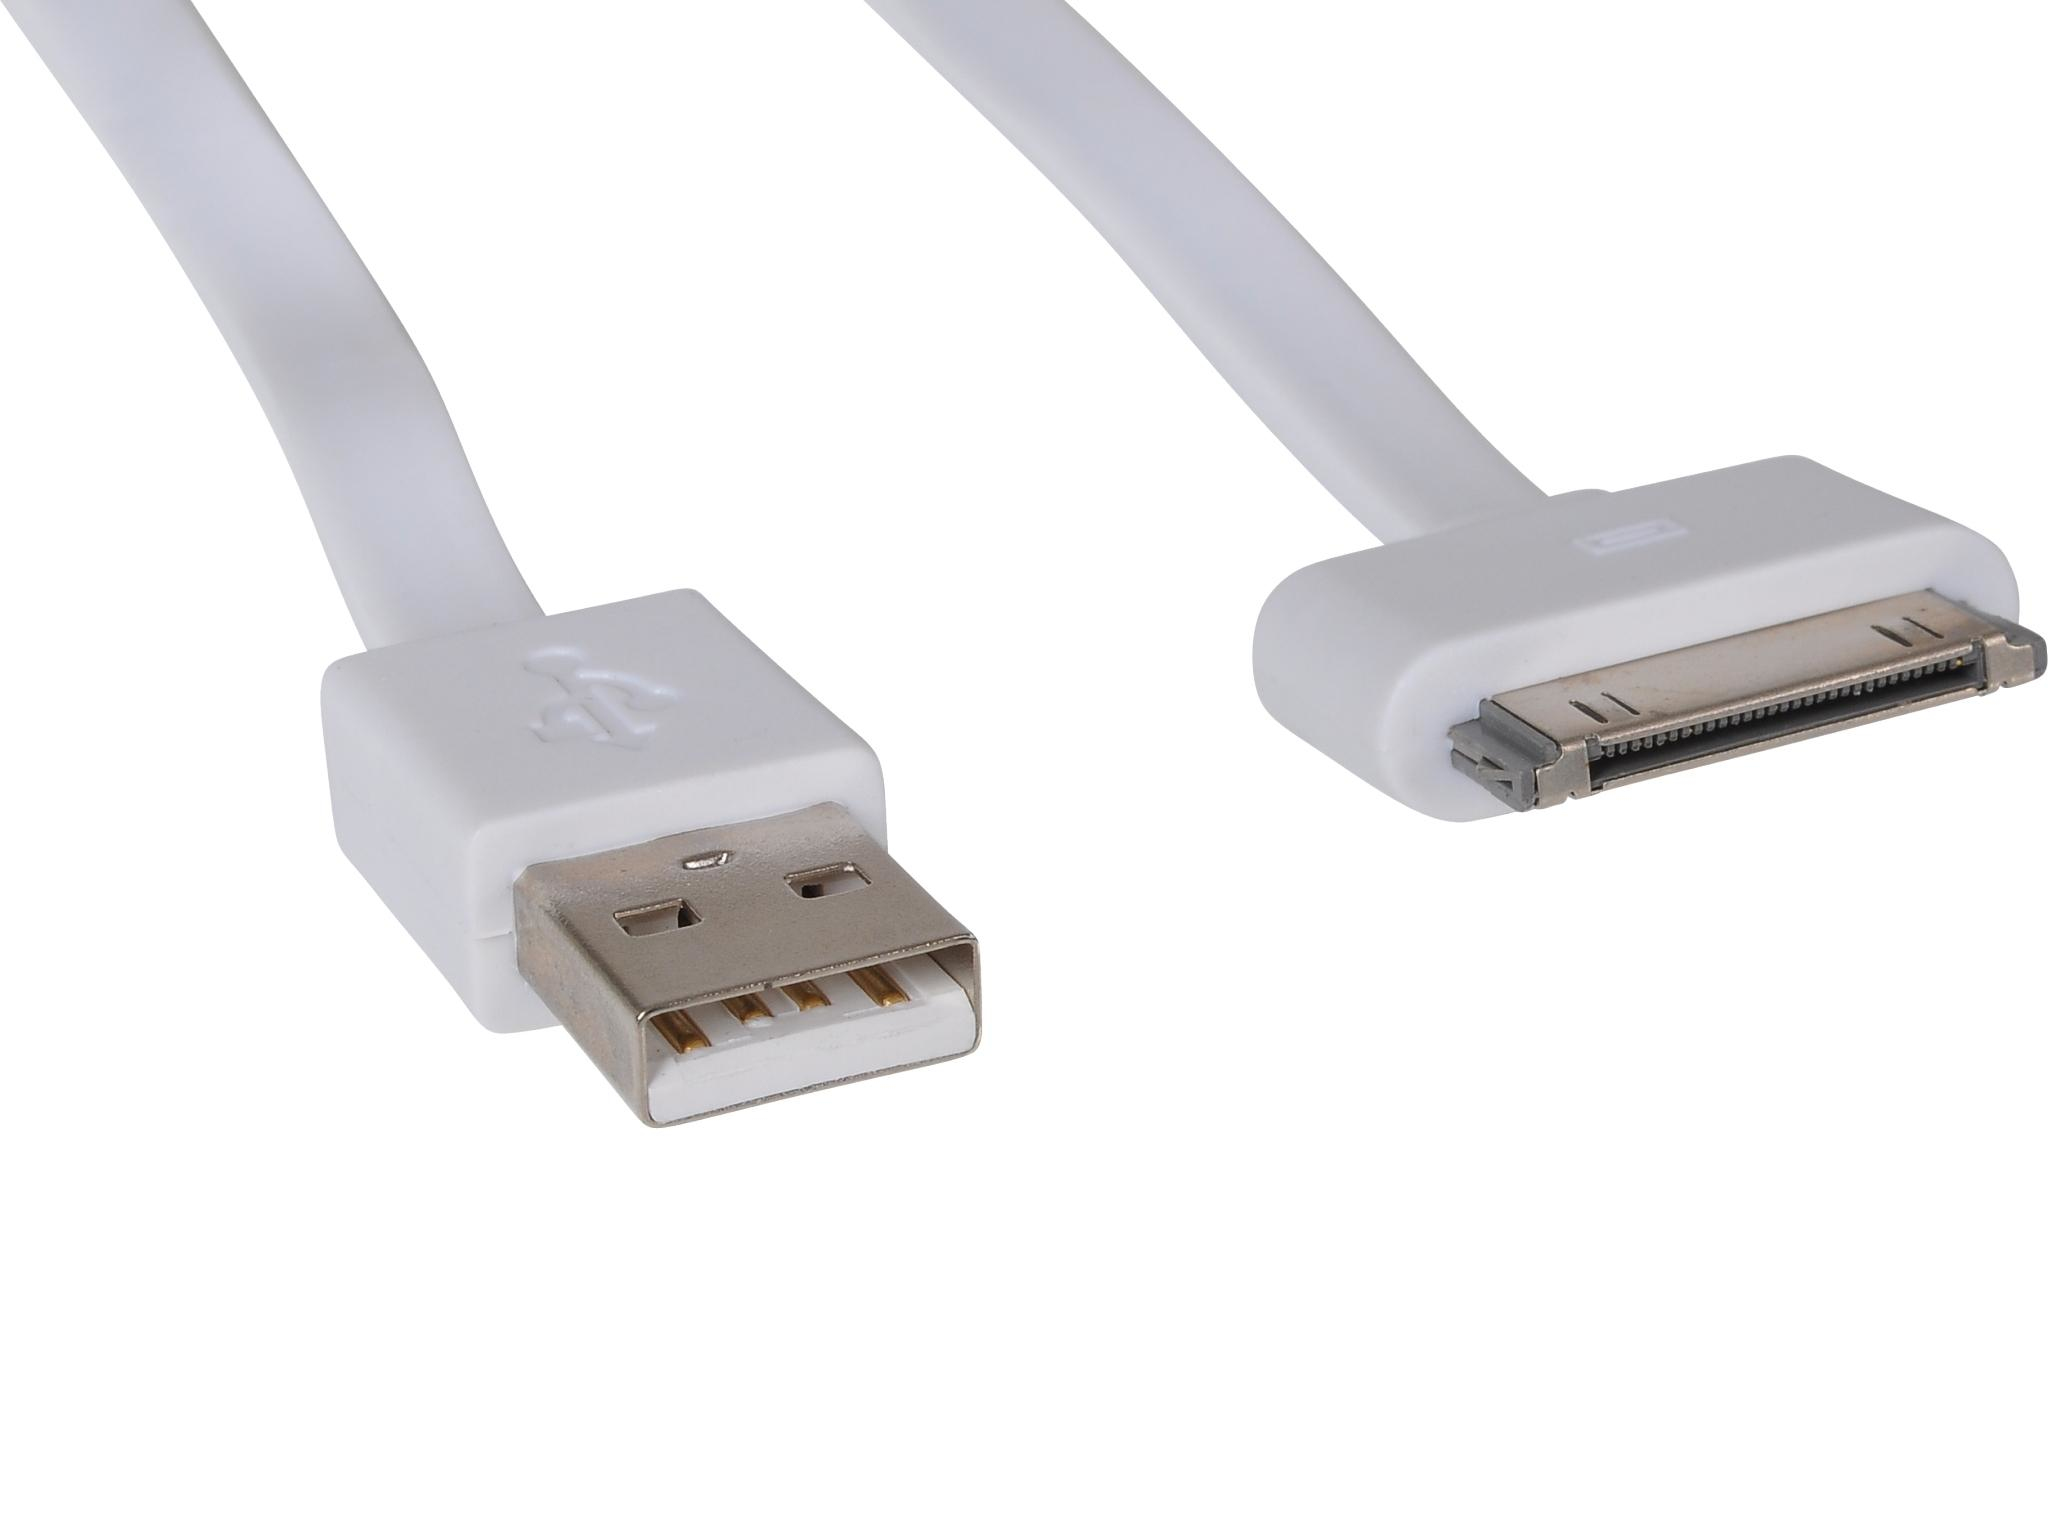 SANDBERG A/S Sandberg USB 30pin Cable Flat 0.15m